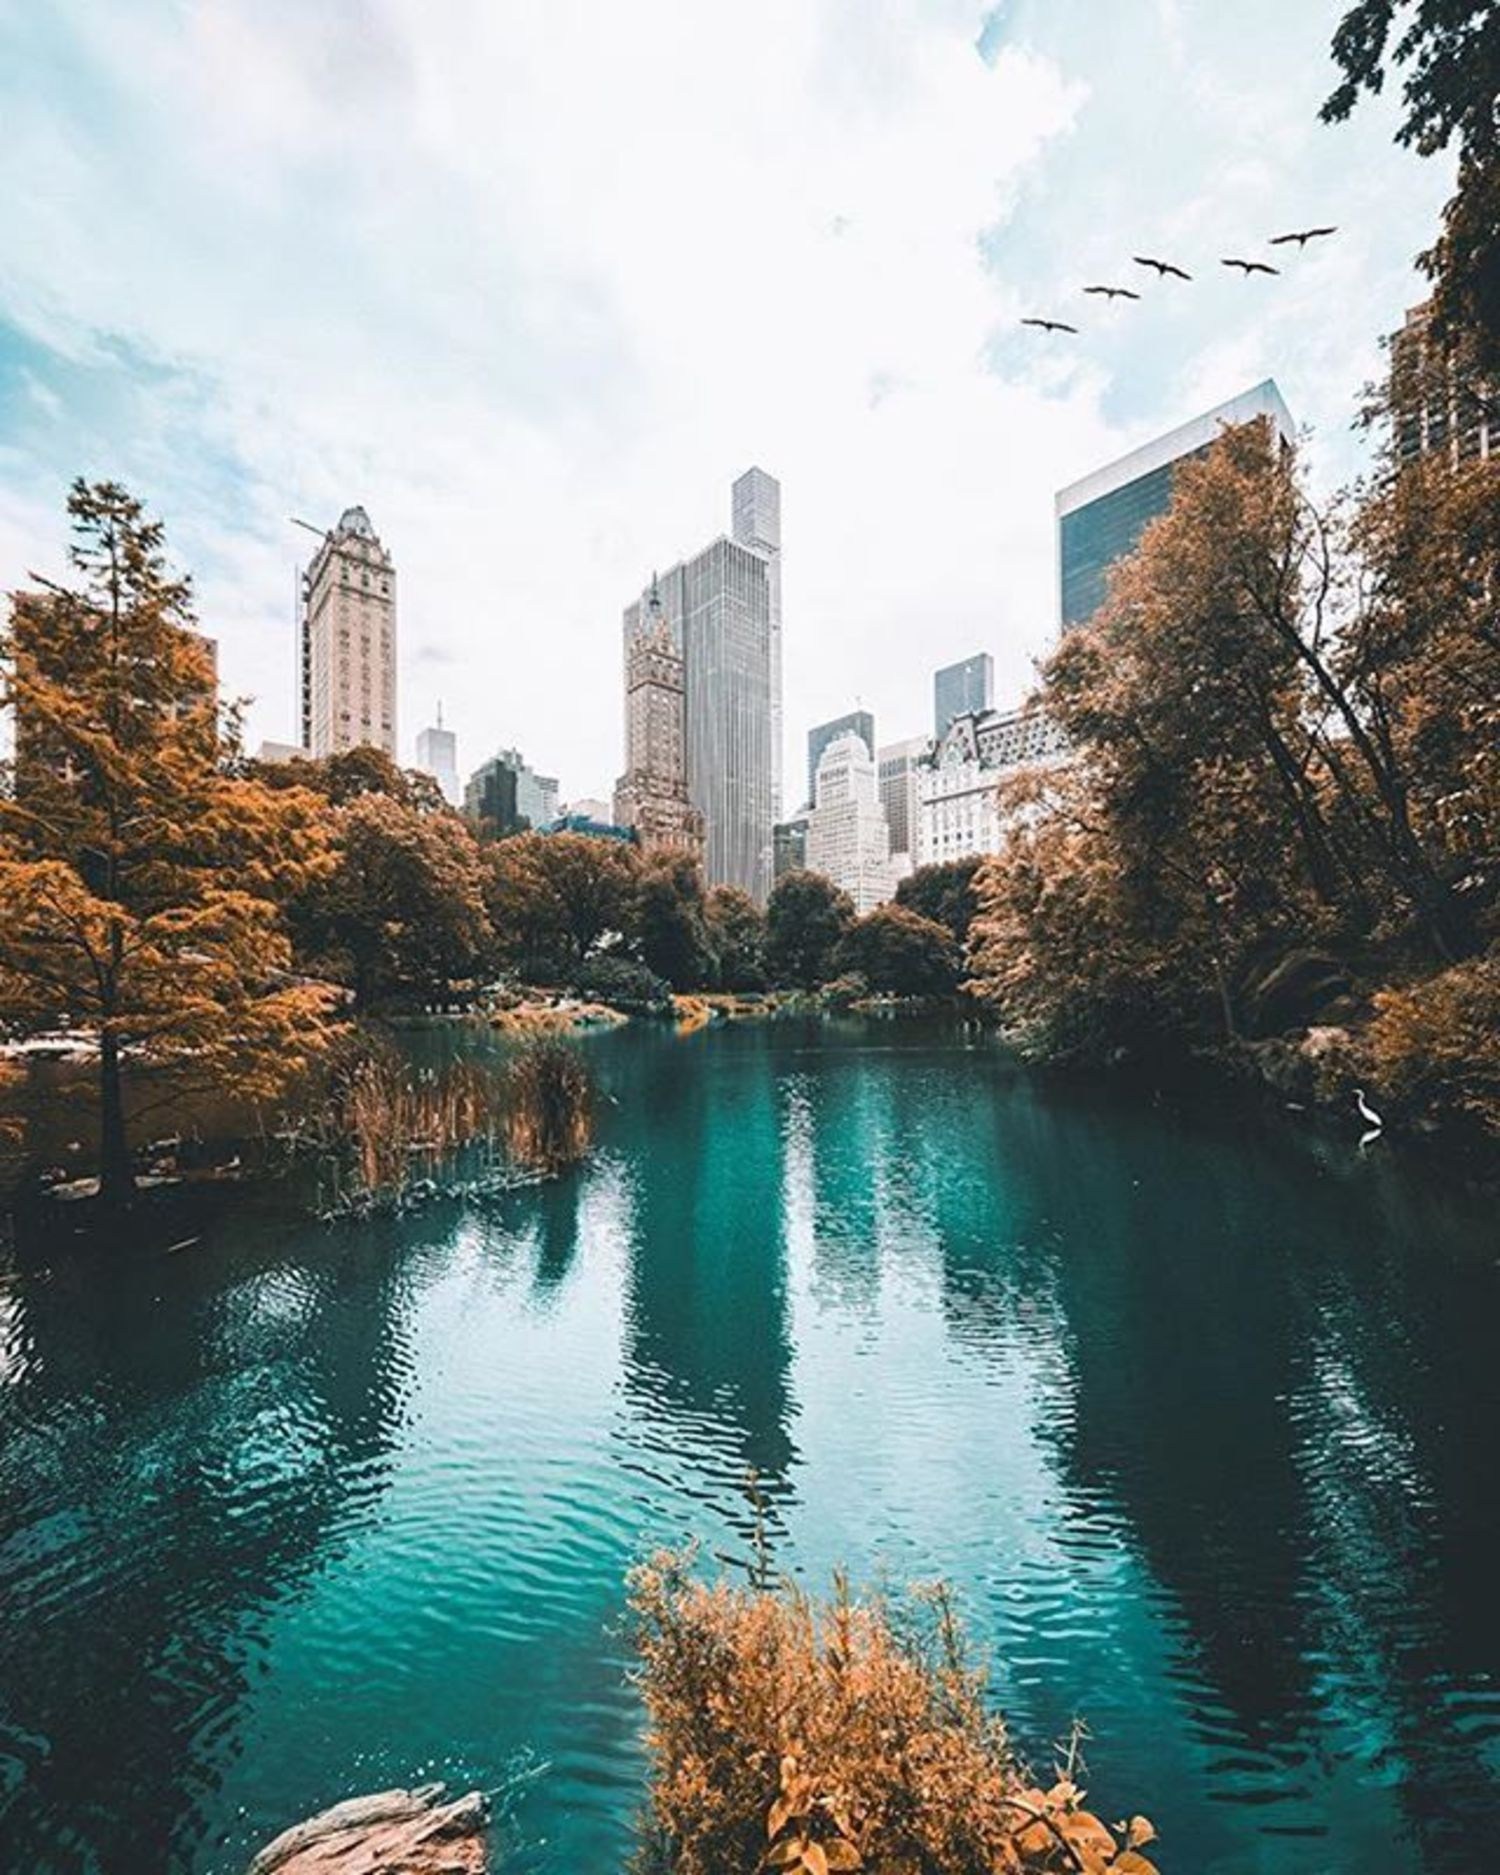 Central Park, New York. Photo via @206shooter #viewingnyc #newyorkcity #newyork #nyc